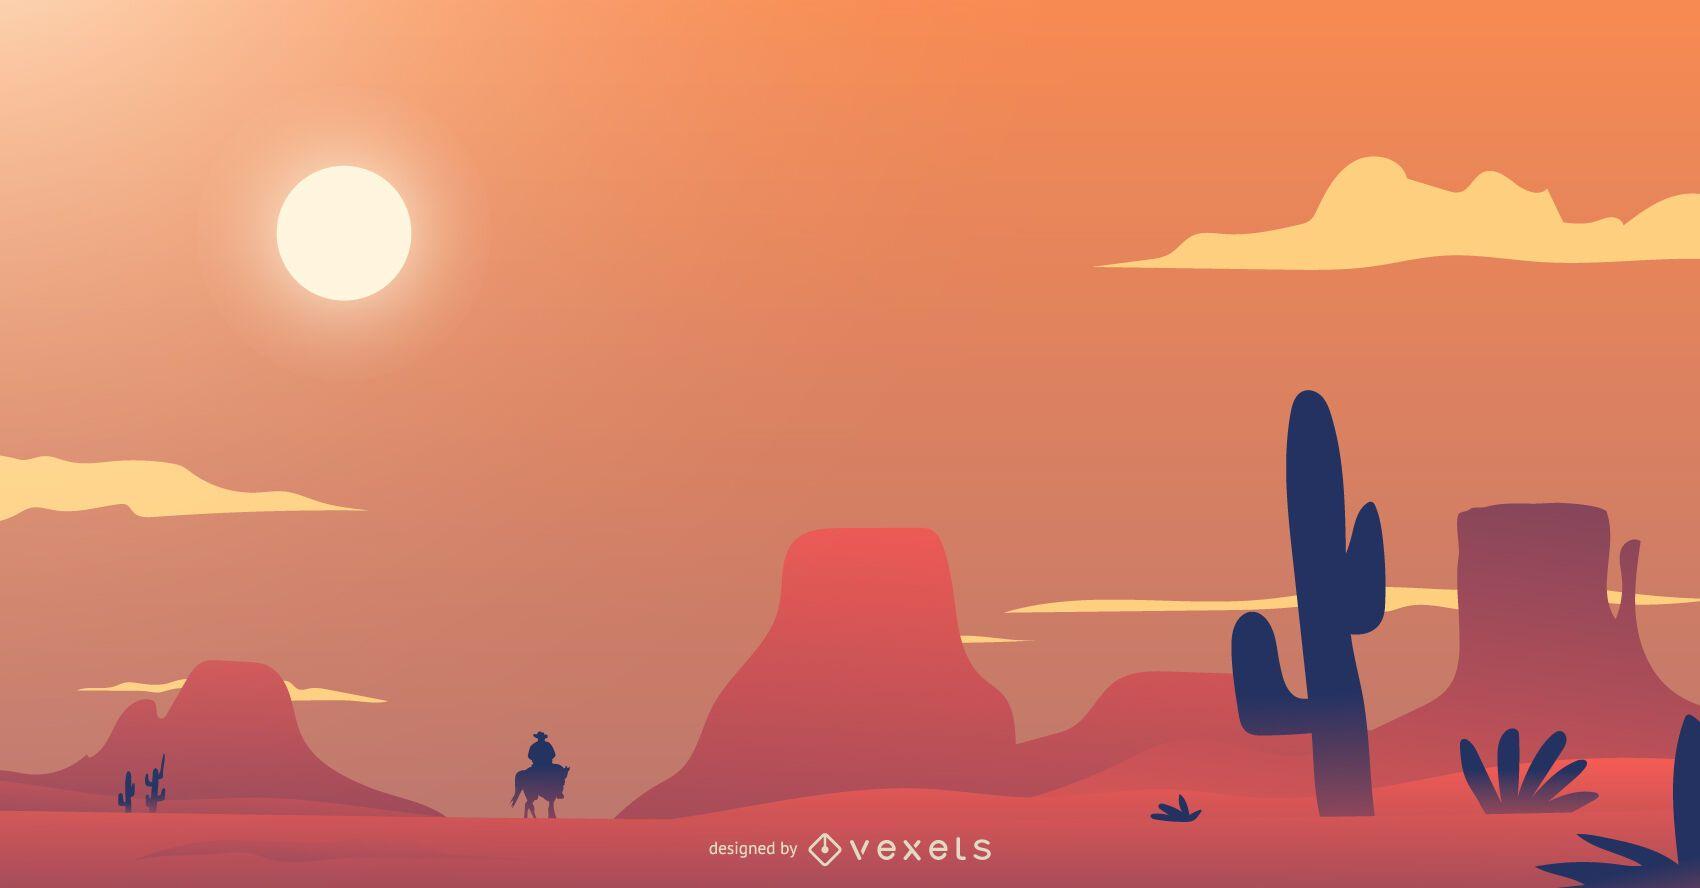 Desert background with cowboy